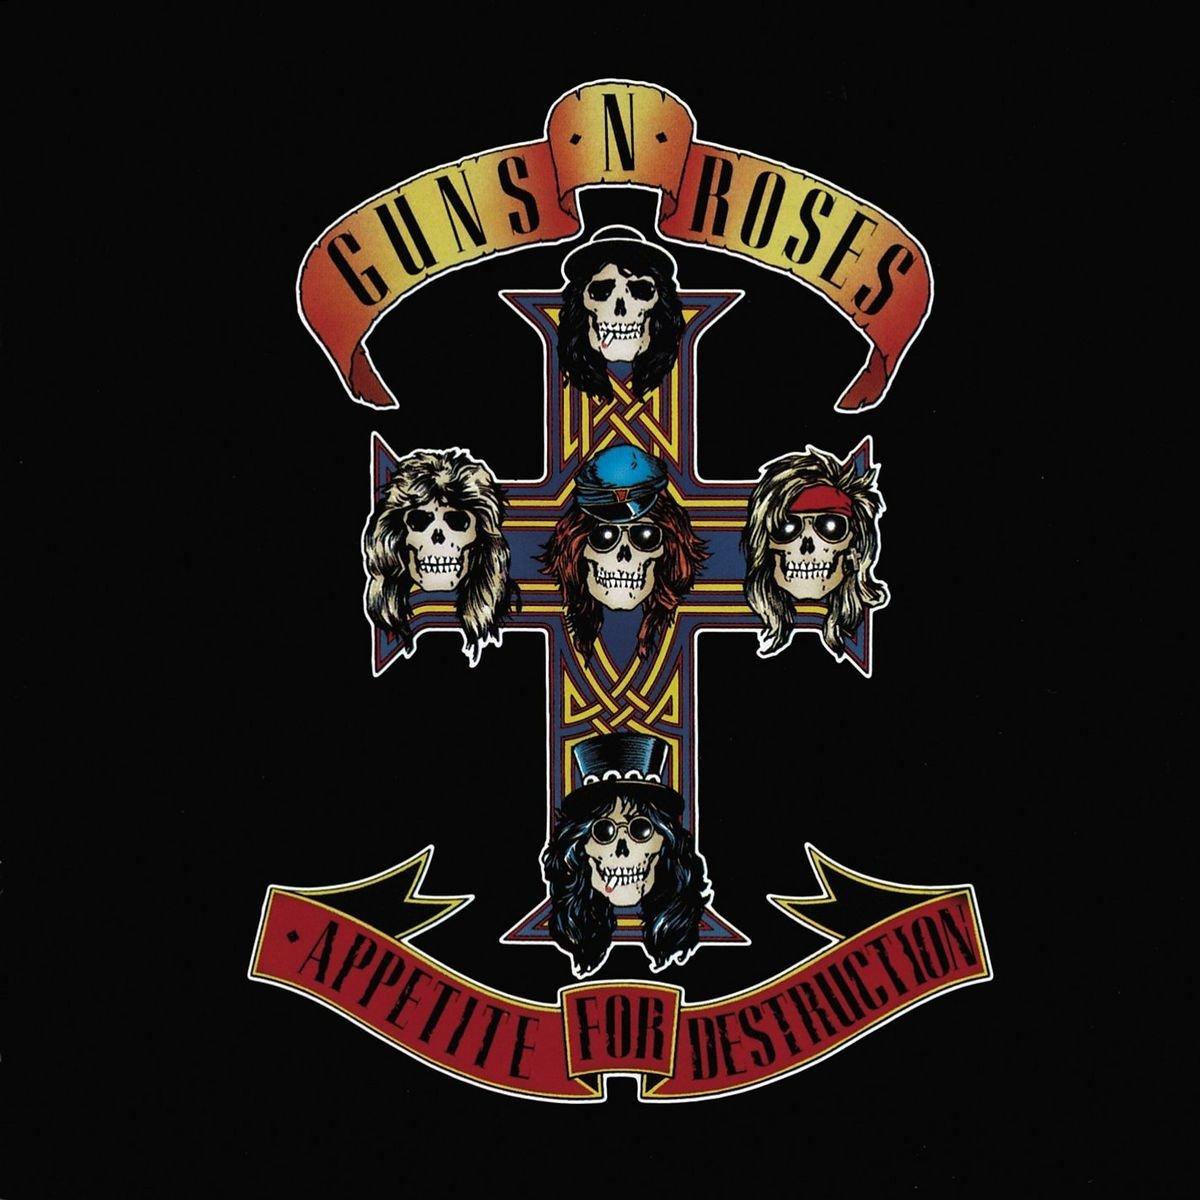 appetite for destruction Top 50 Albums of 1987